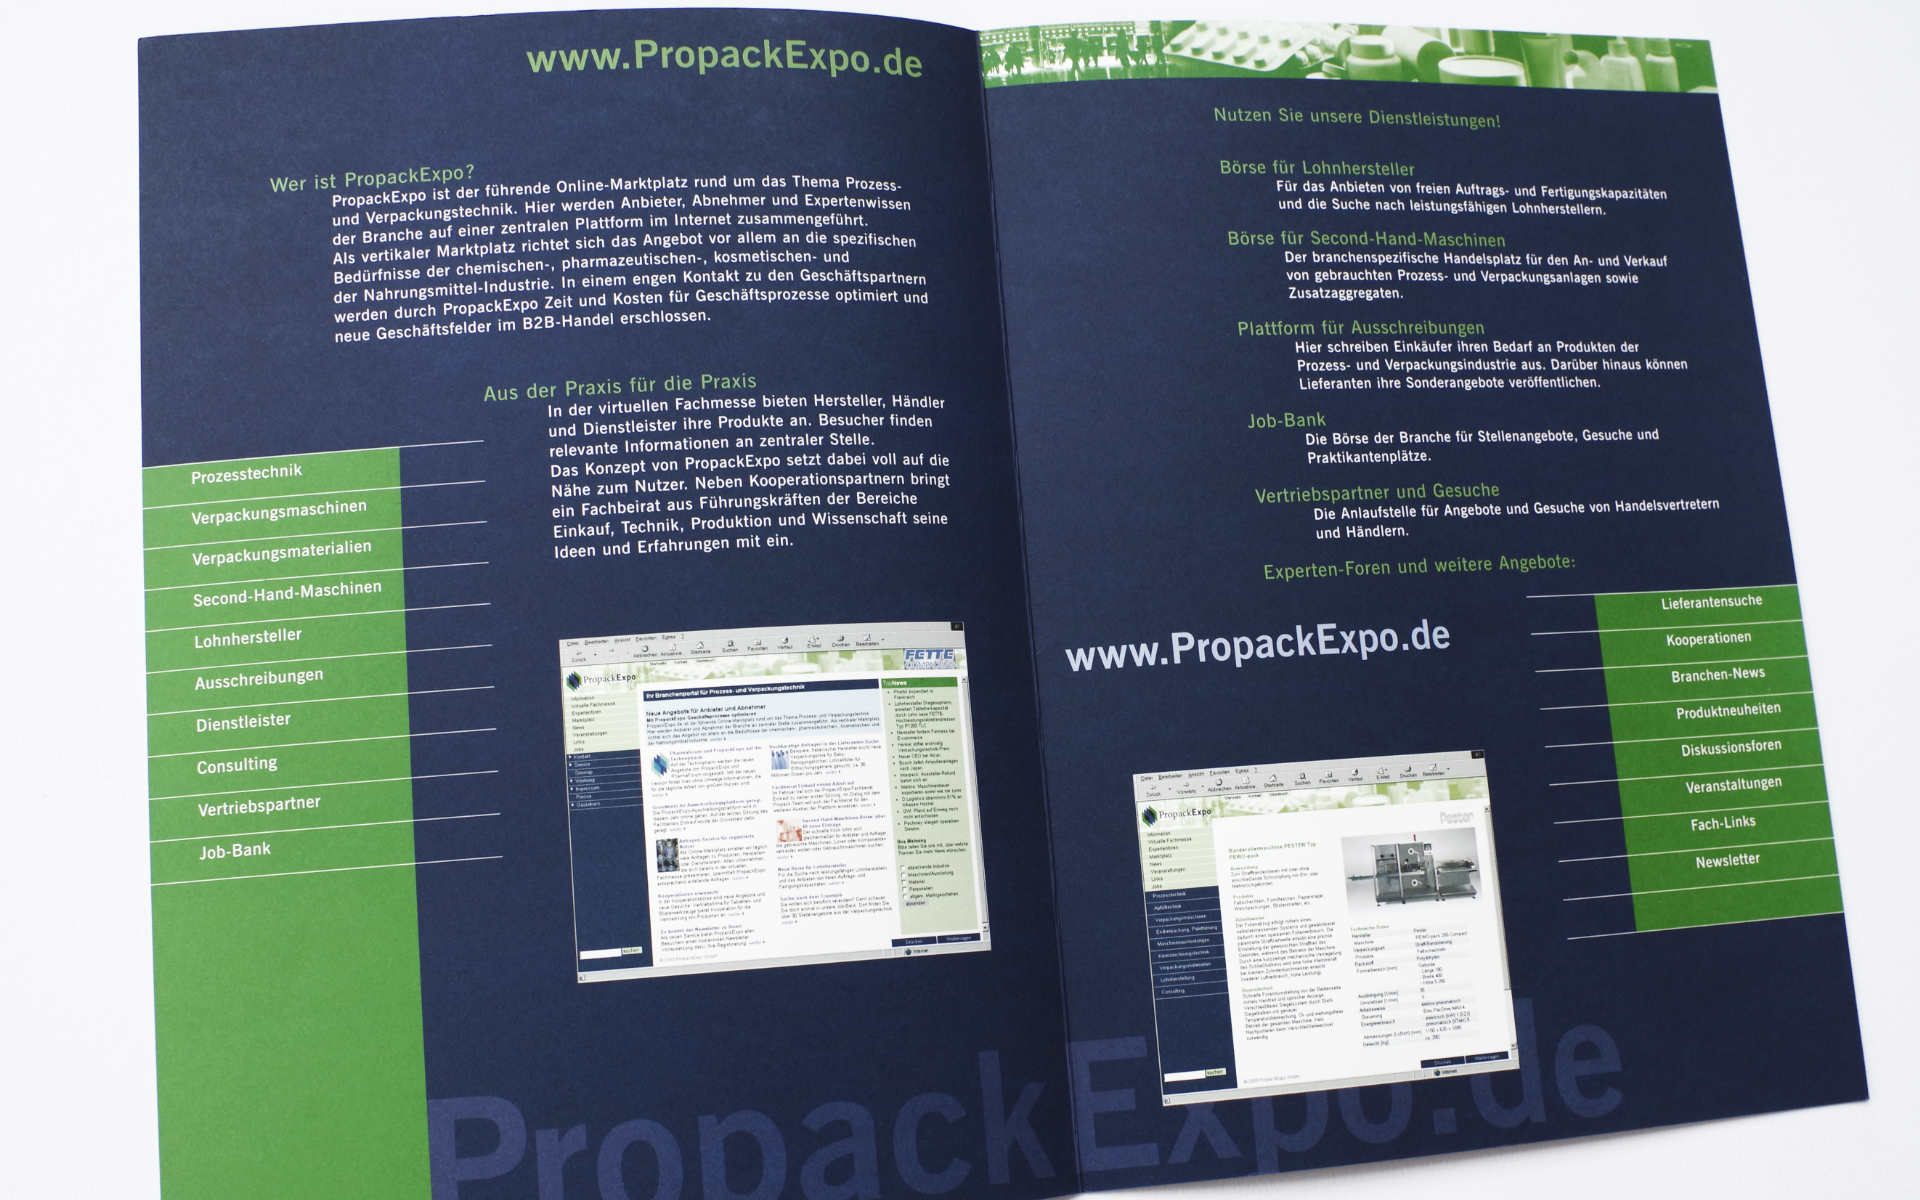 PropackExpo Imagebroschuere Design